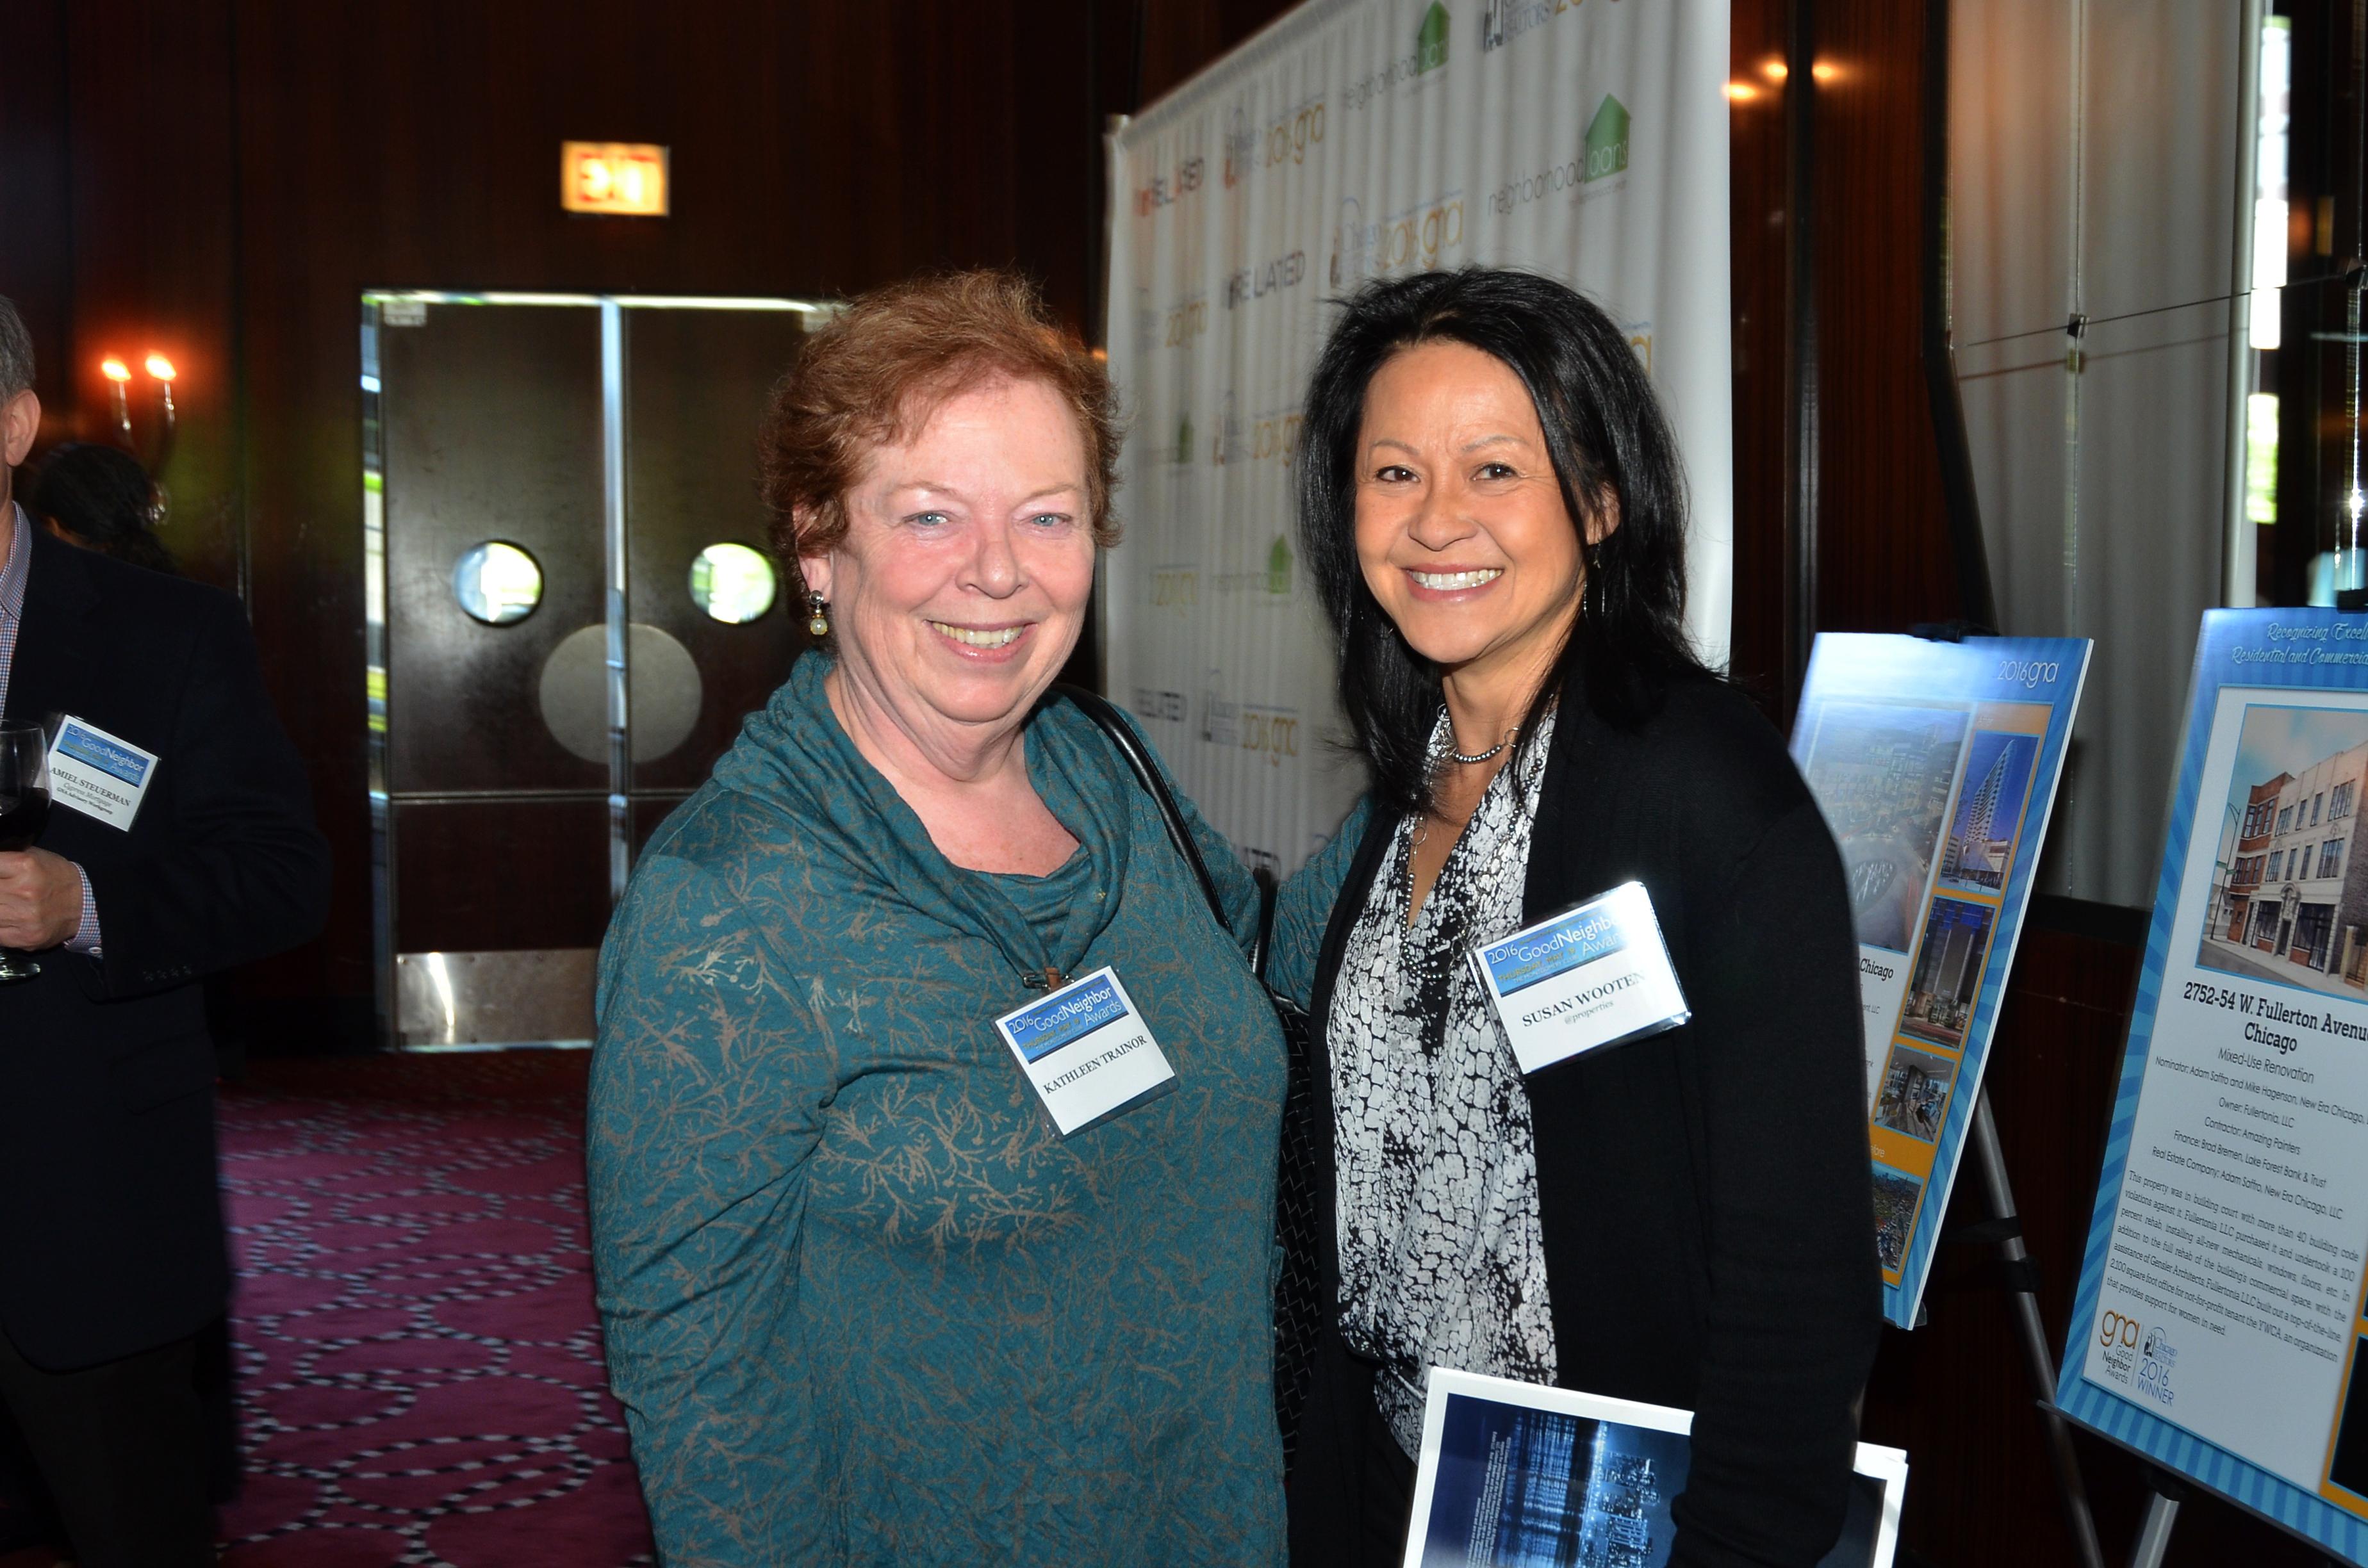 035-Kathleen-Trainor-Susan-Wooten-JPG.jpg